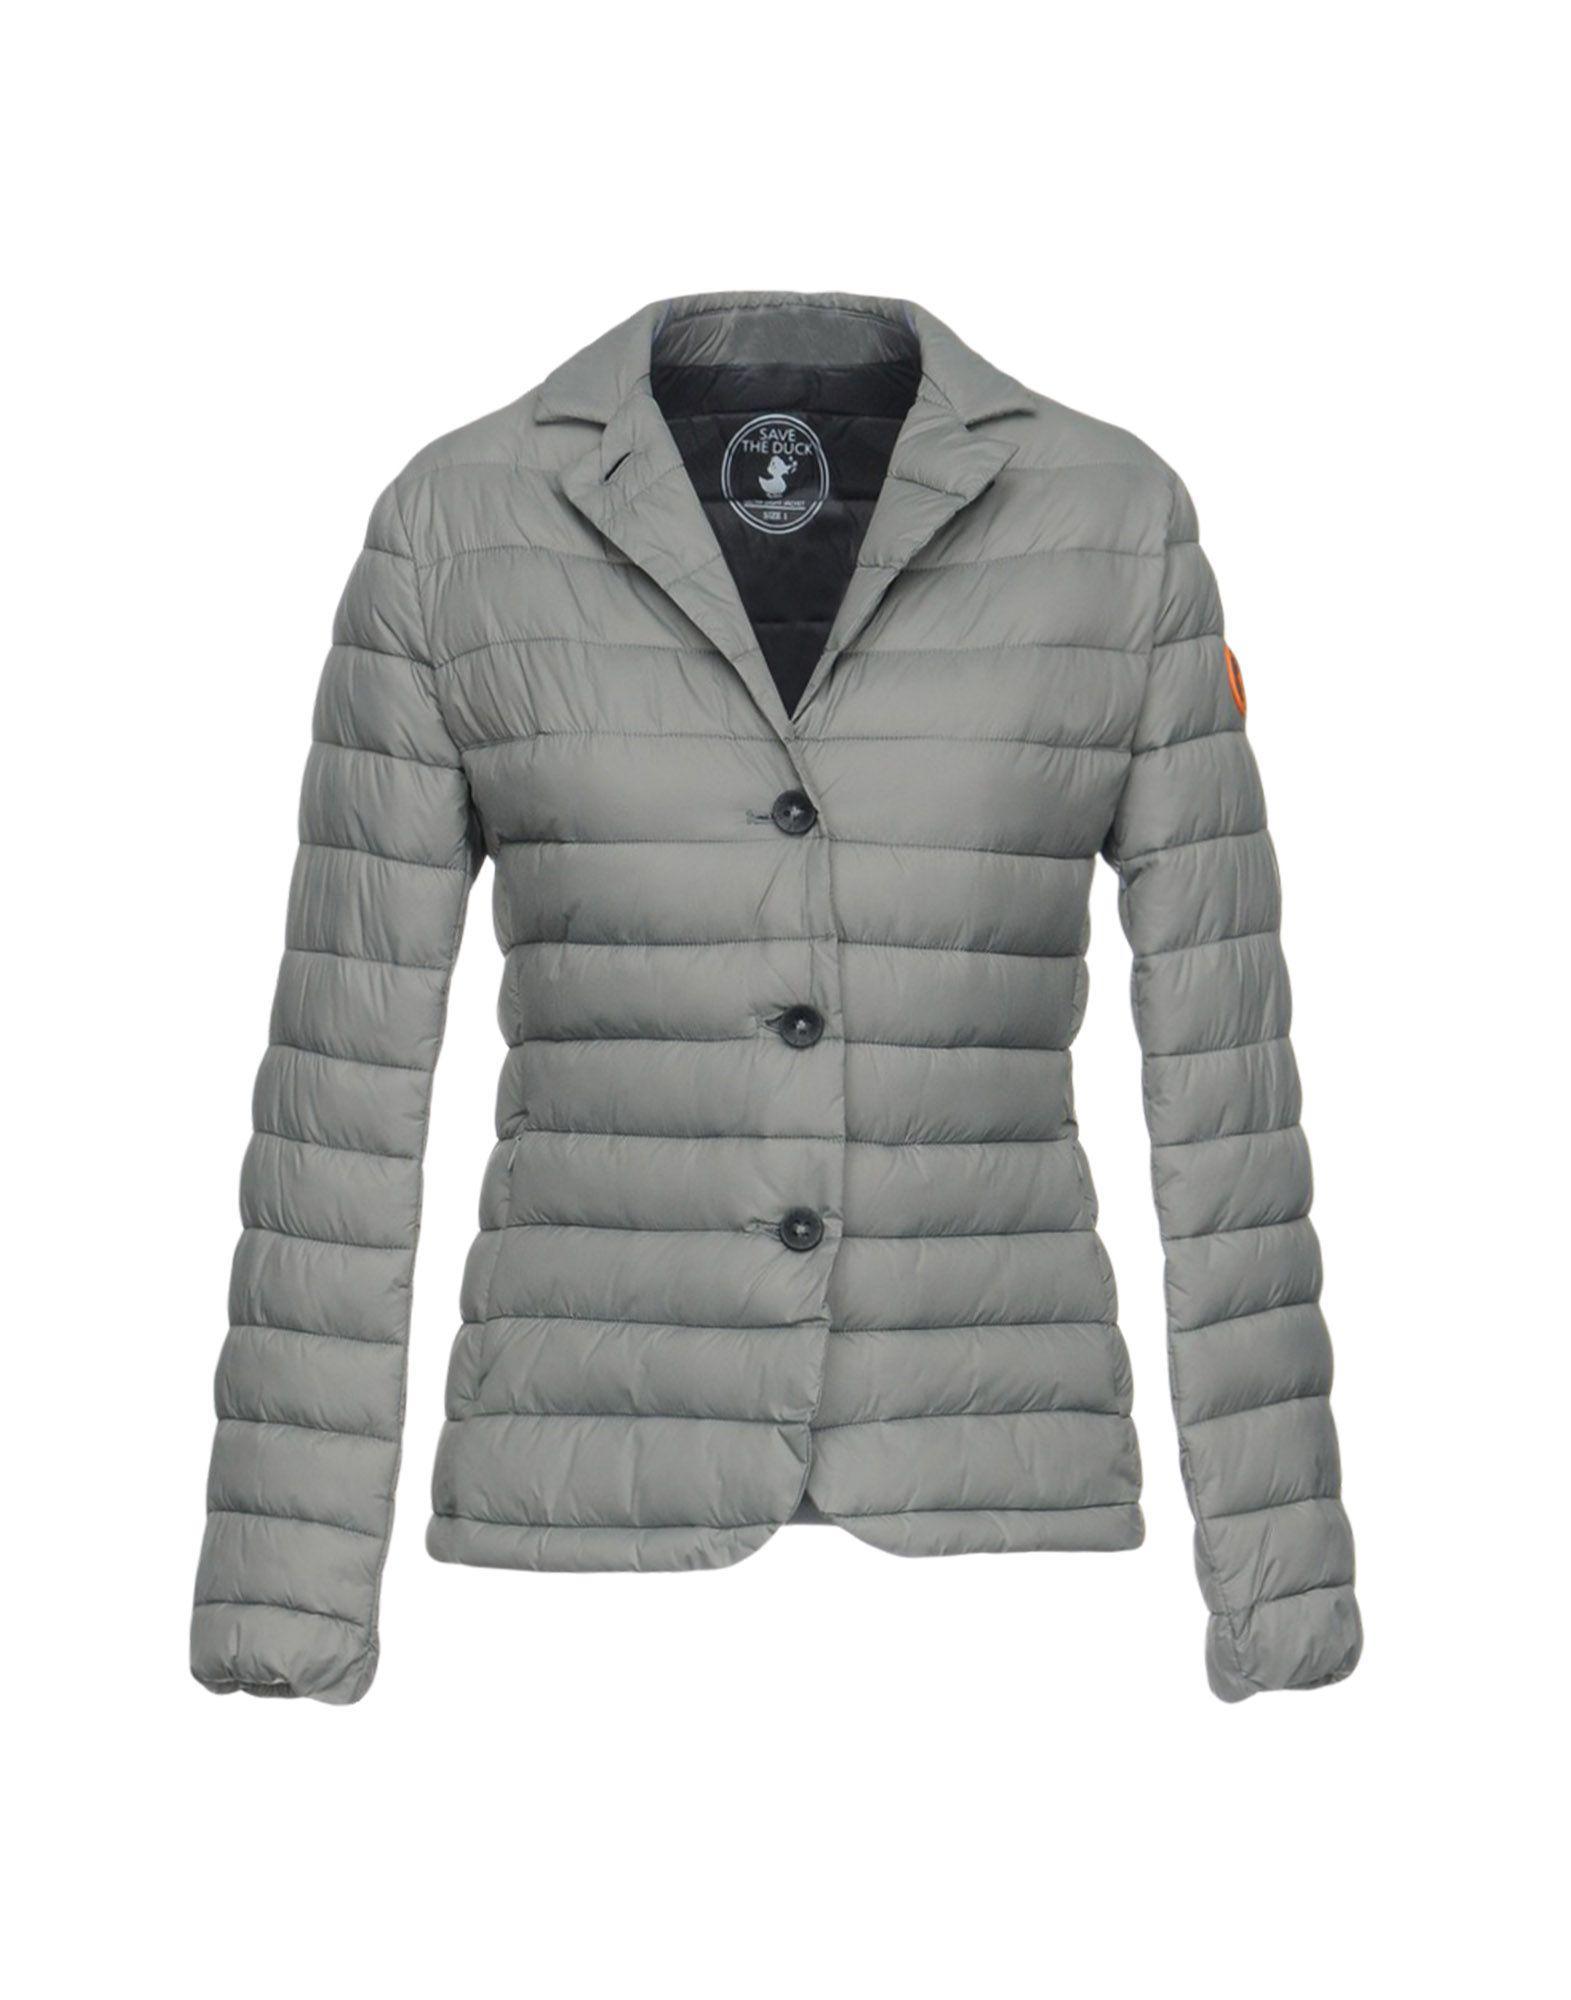 52206bbdc198 https   www.lyst.com clothing dl1961-renee-denim-shorts-2  2018-05 ...